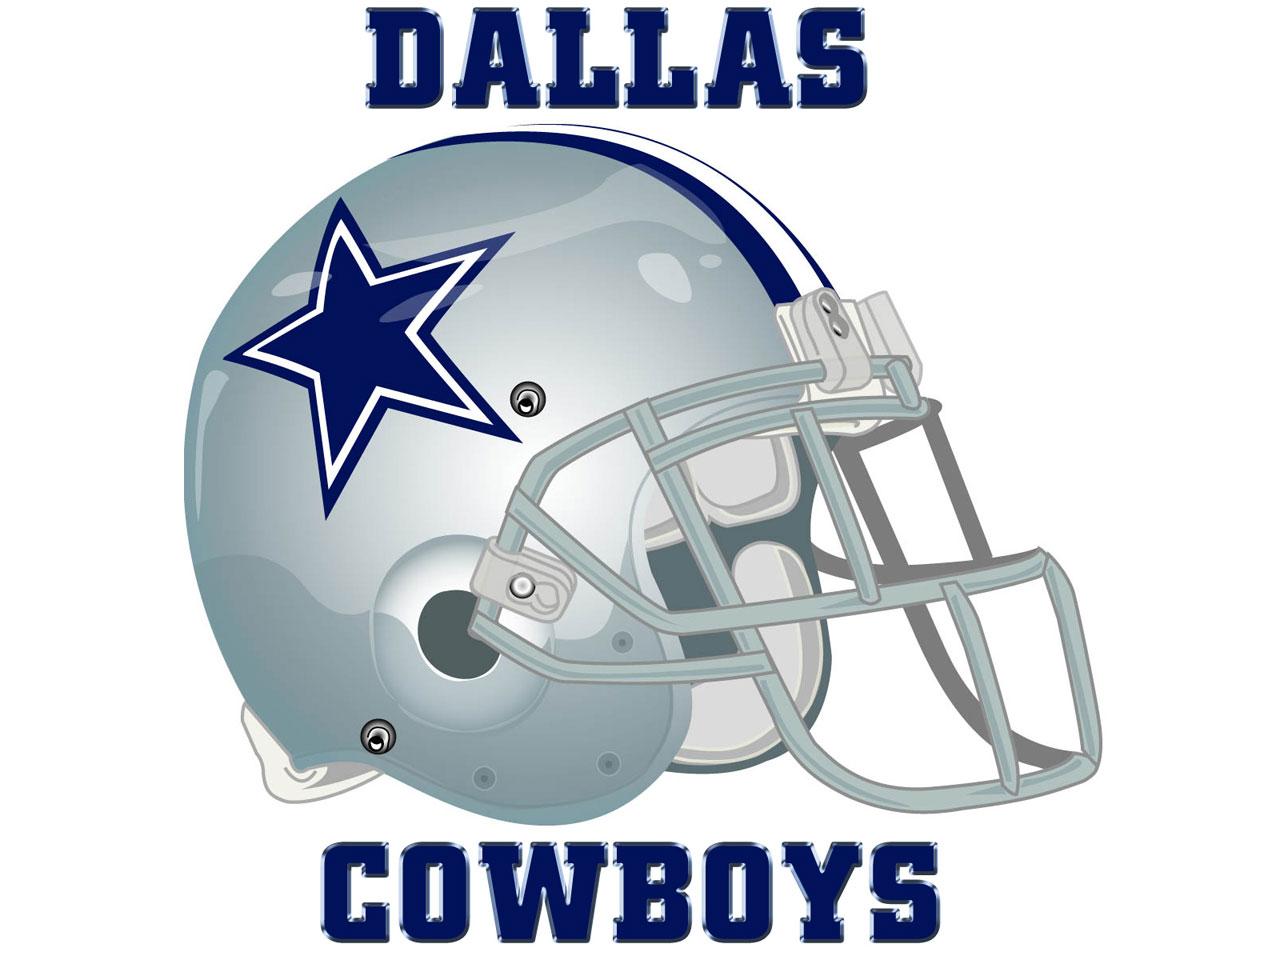 New Dallas Cowboys wallpaper background Dallas Cowboys wallpapers 1280x960